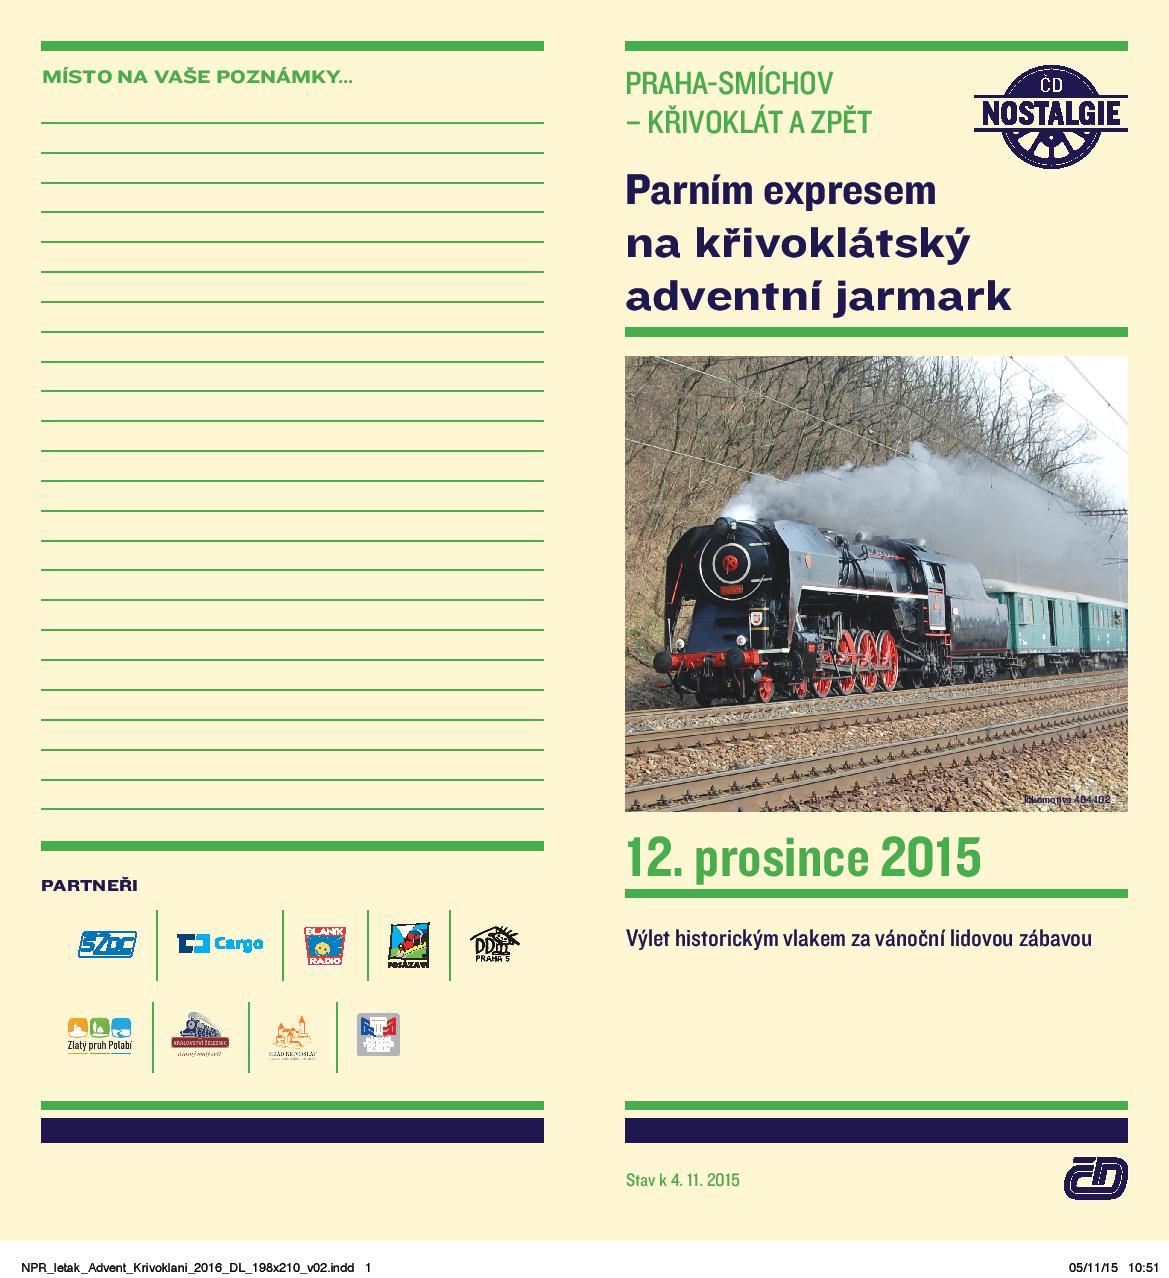 Mikulas_krivoklat 2015a